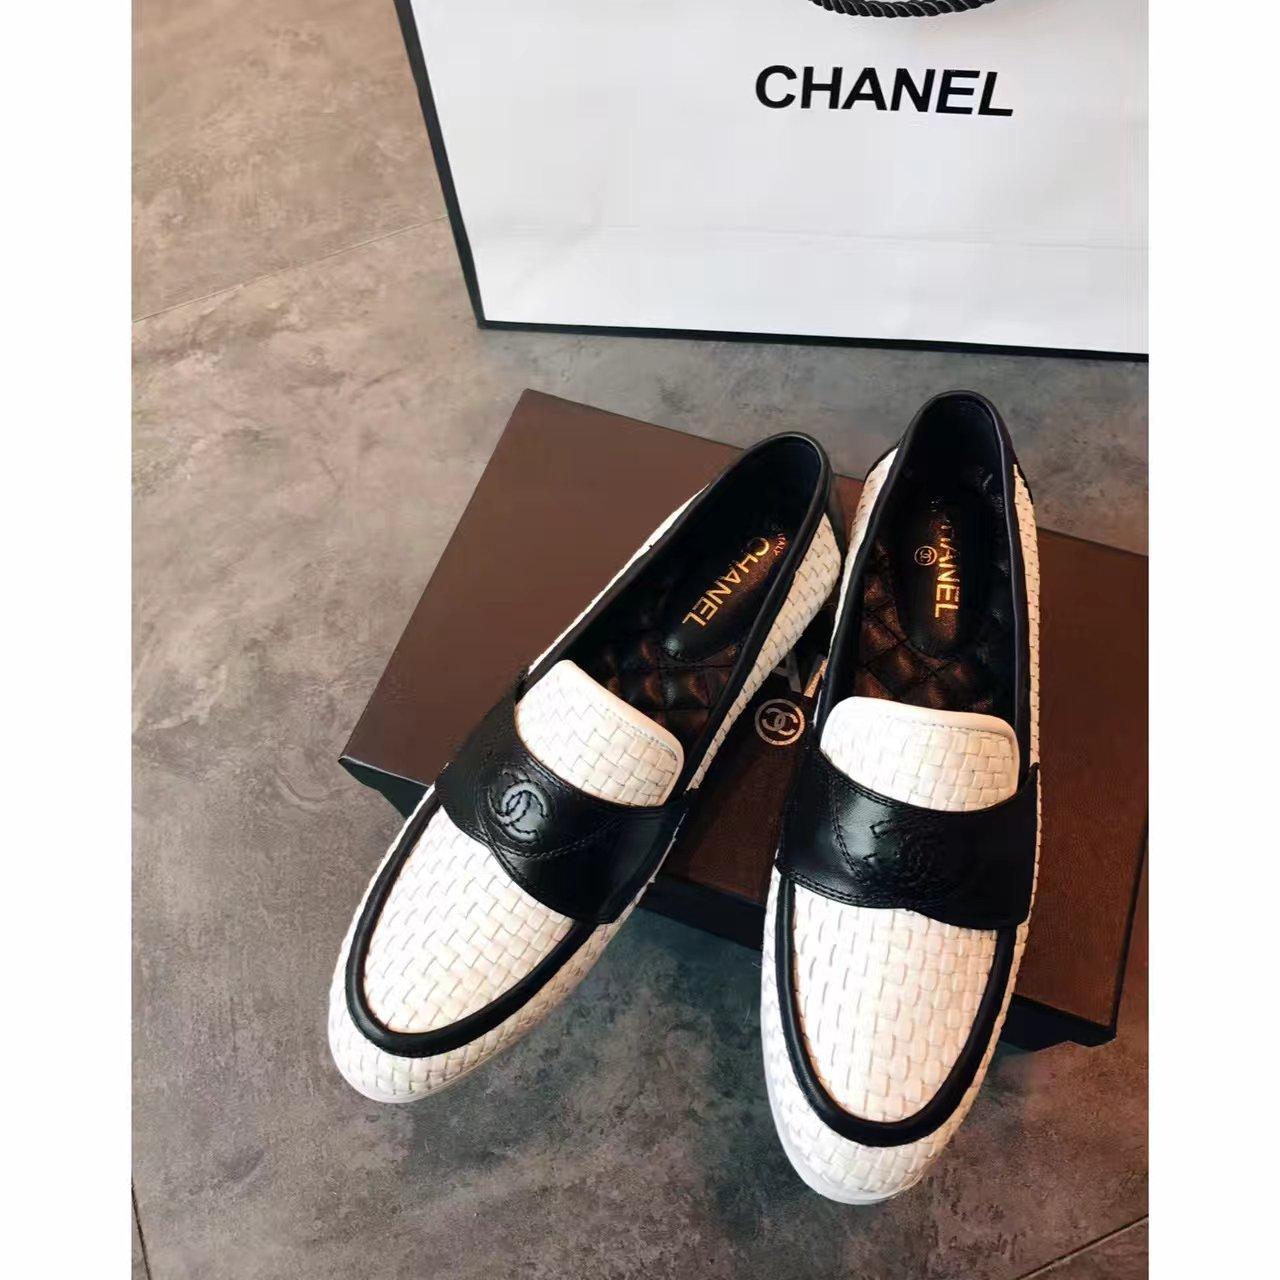 Chanel单鞋_2017款香奈儿女鞋价格